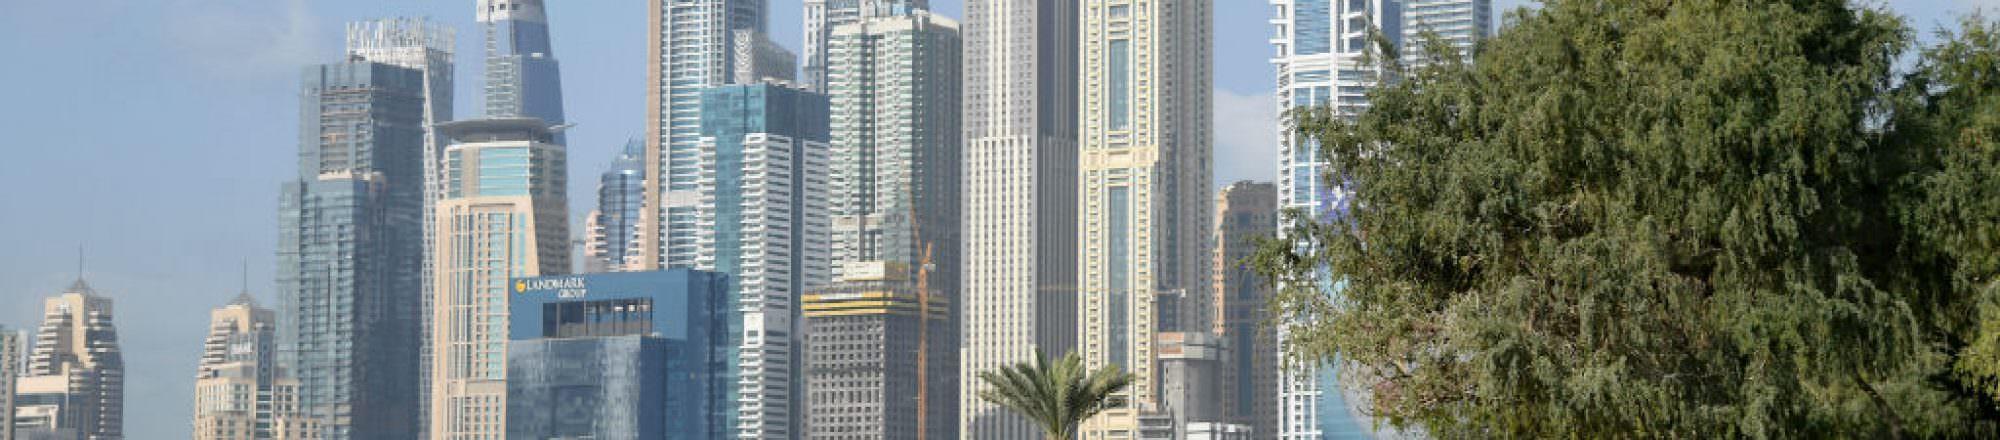 Omega Dubai Desert Classic leaderboard